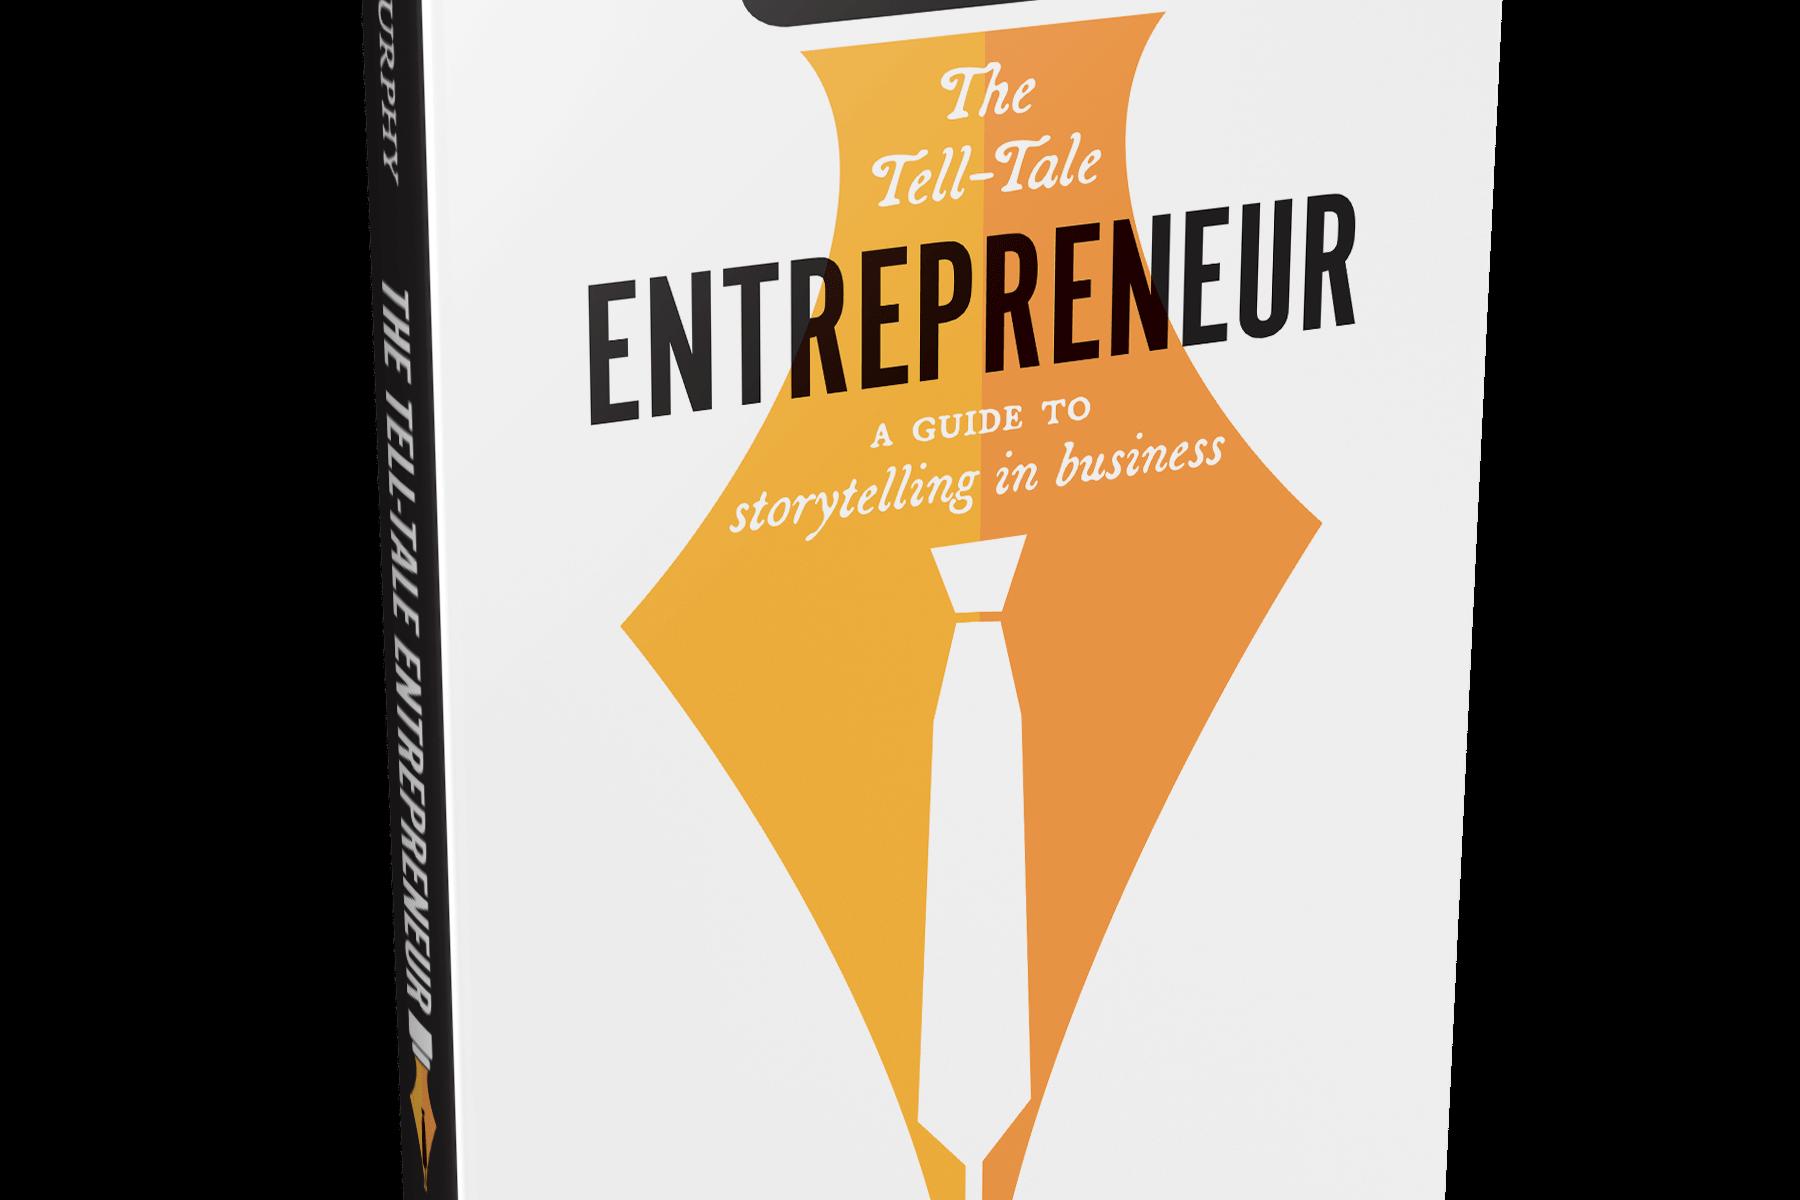 The Tell-Tale Entrepreneur